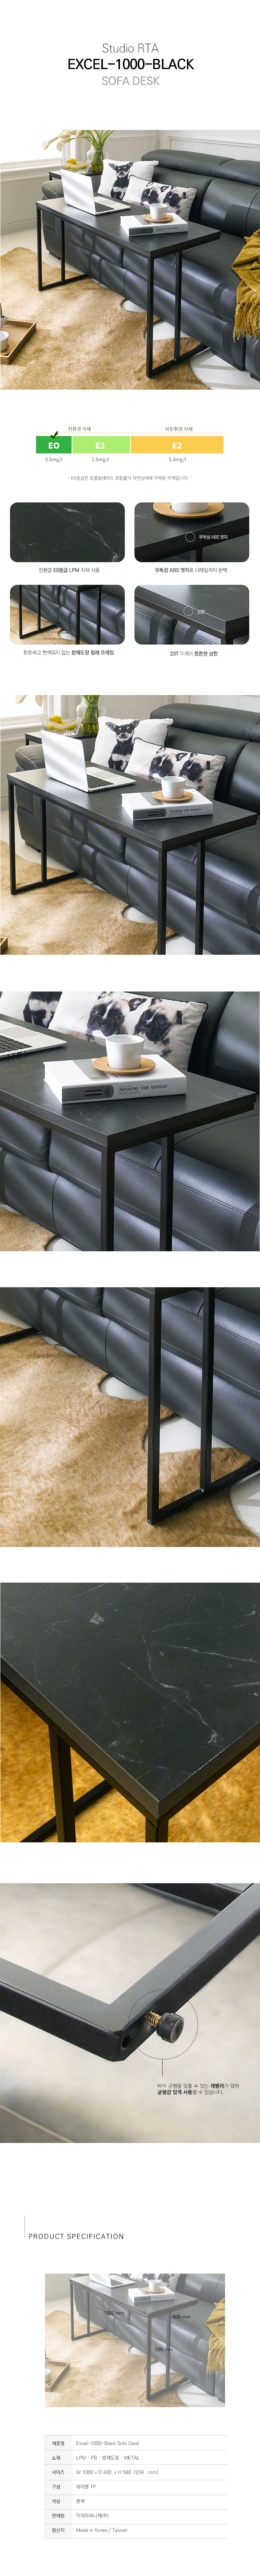 5_10_Excel-1000-Black_B_Sofa_Desk.jpg